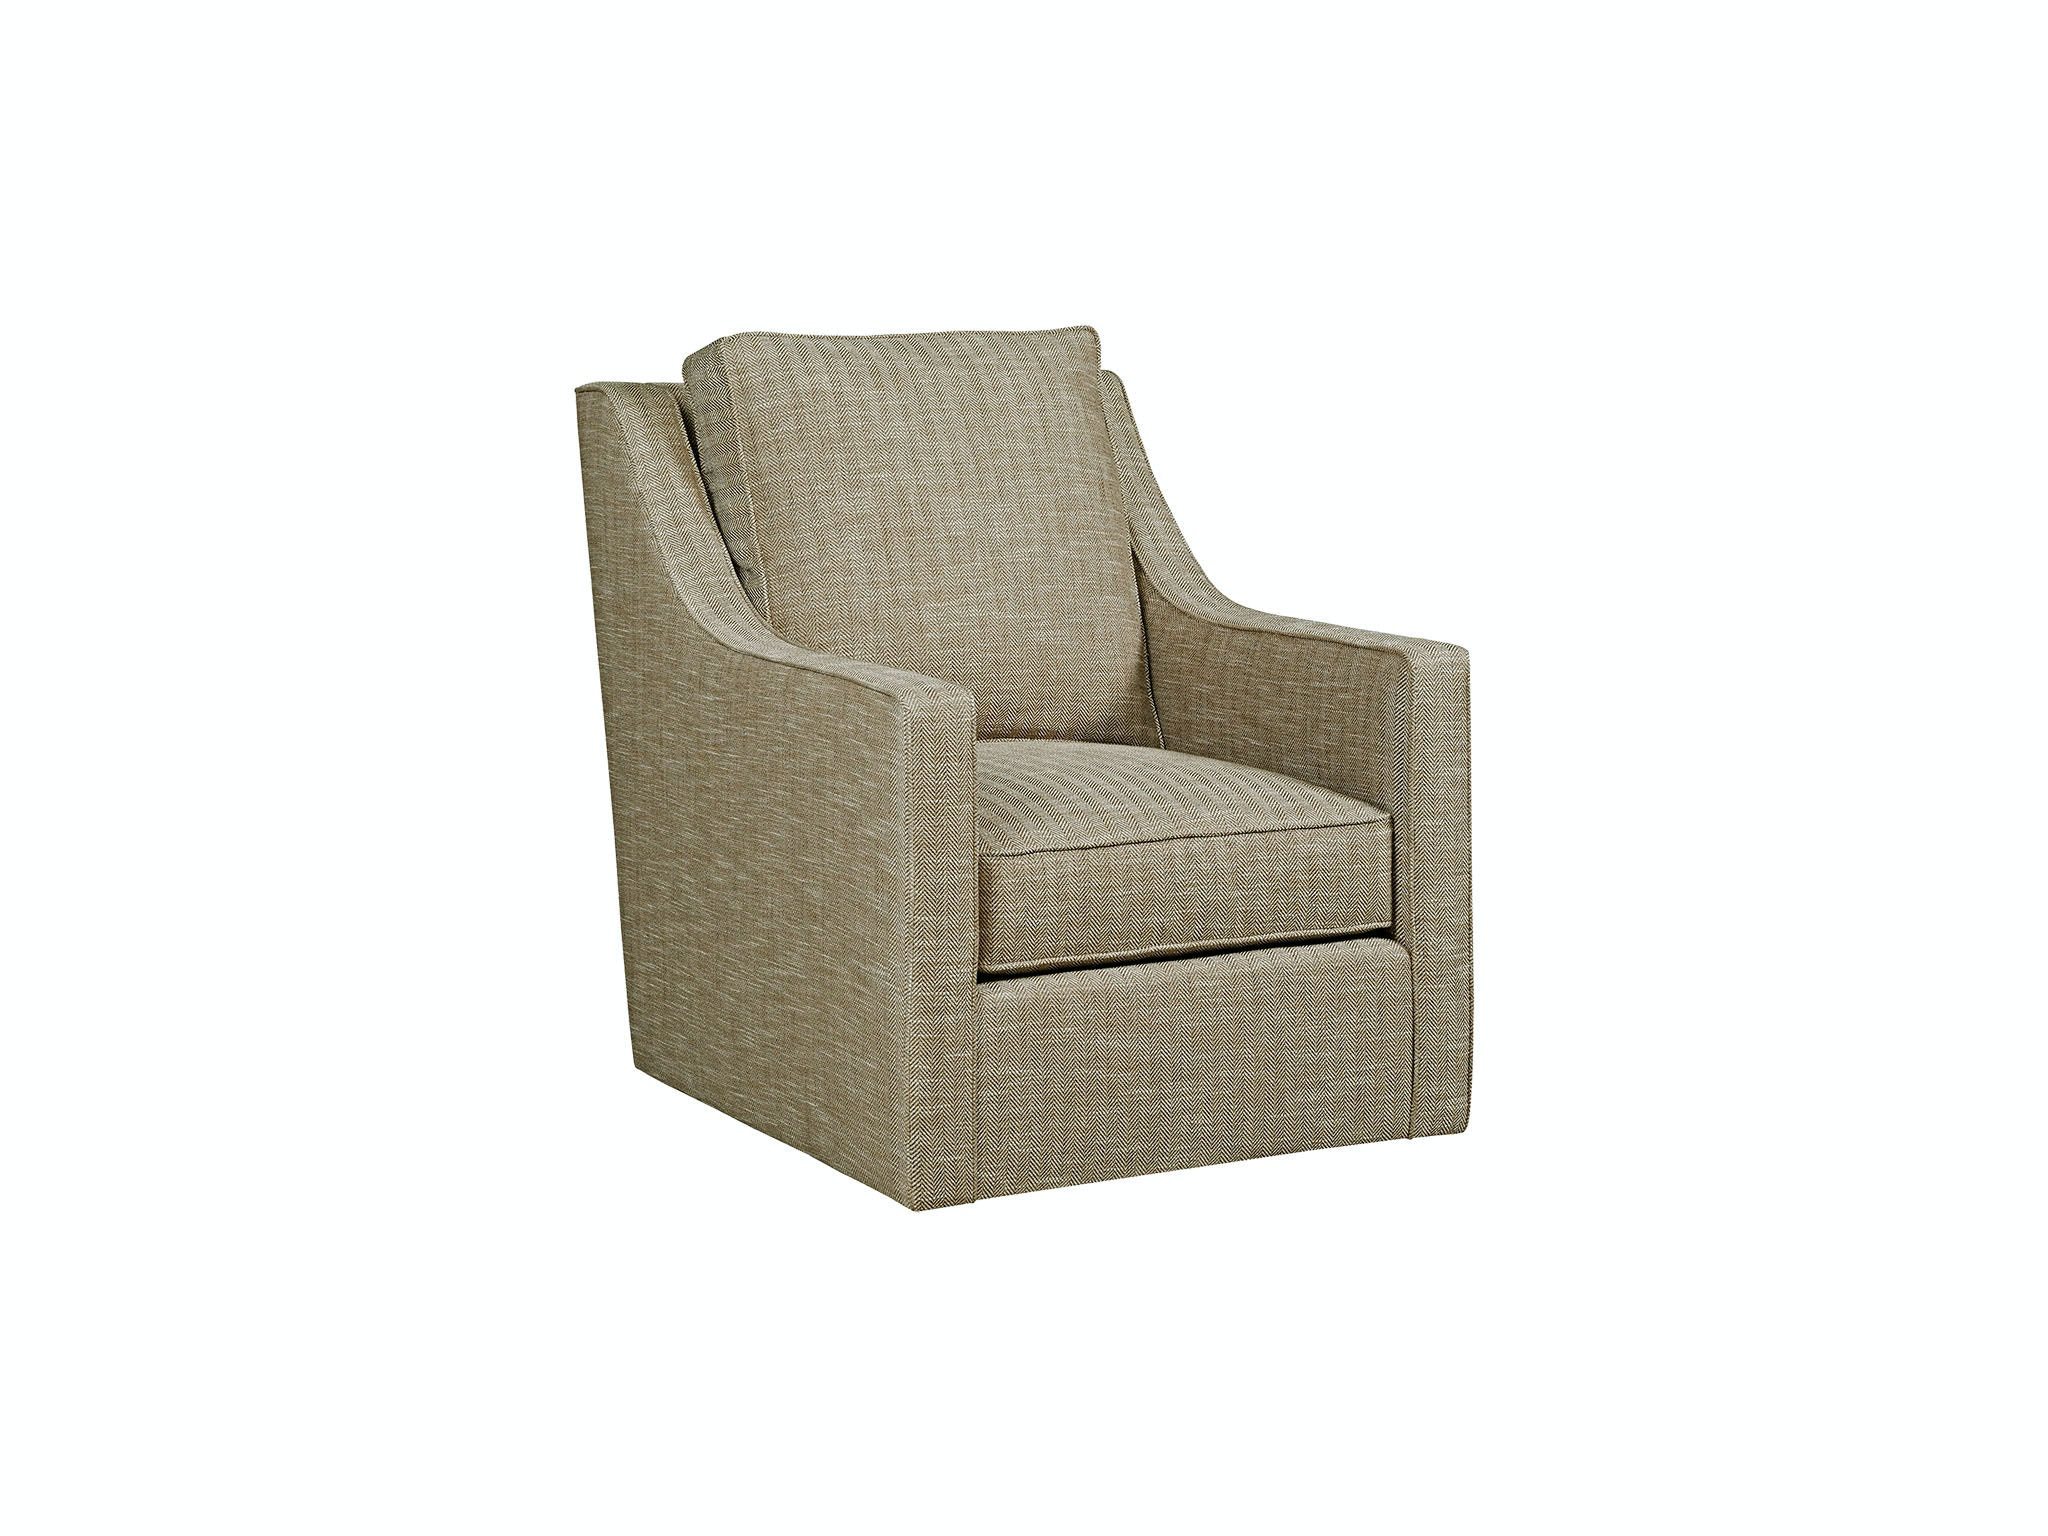 Kincaid Furniture Bradley Swivel Glider Chair 010 02